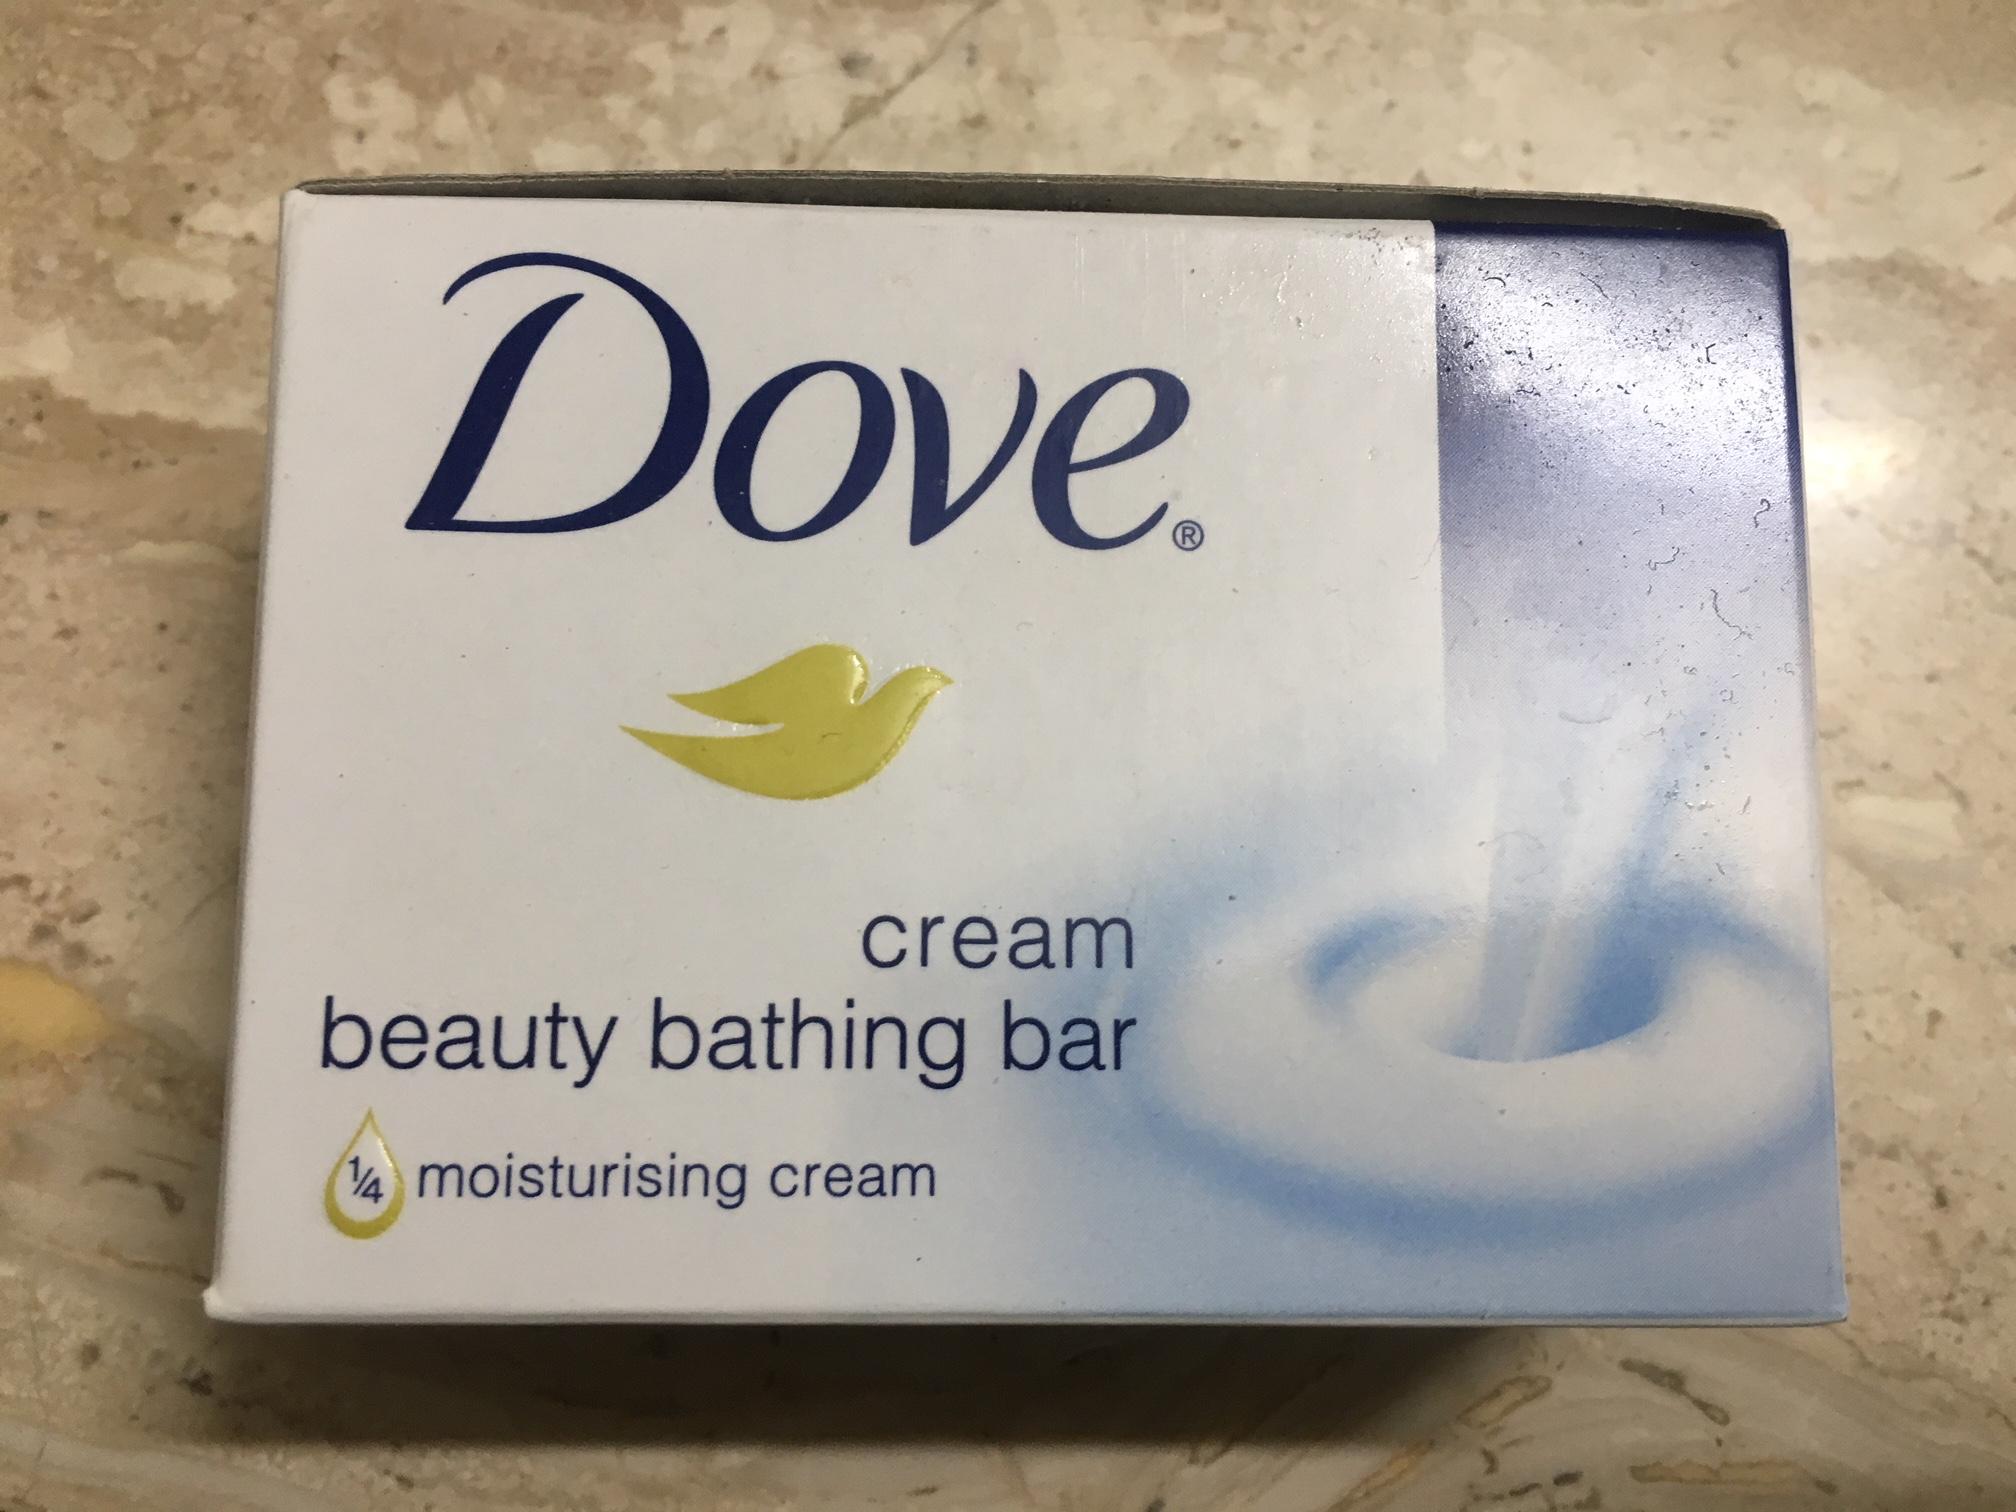 Dove Cream Beauty Bathing Bar -Amazing-By prernakapur